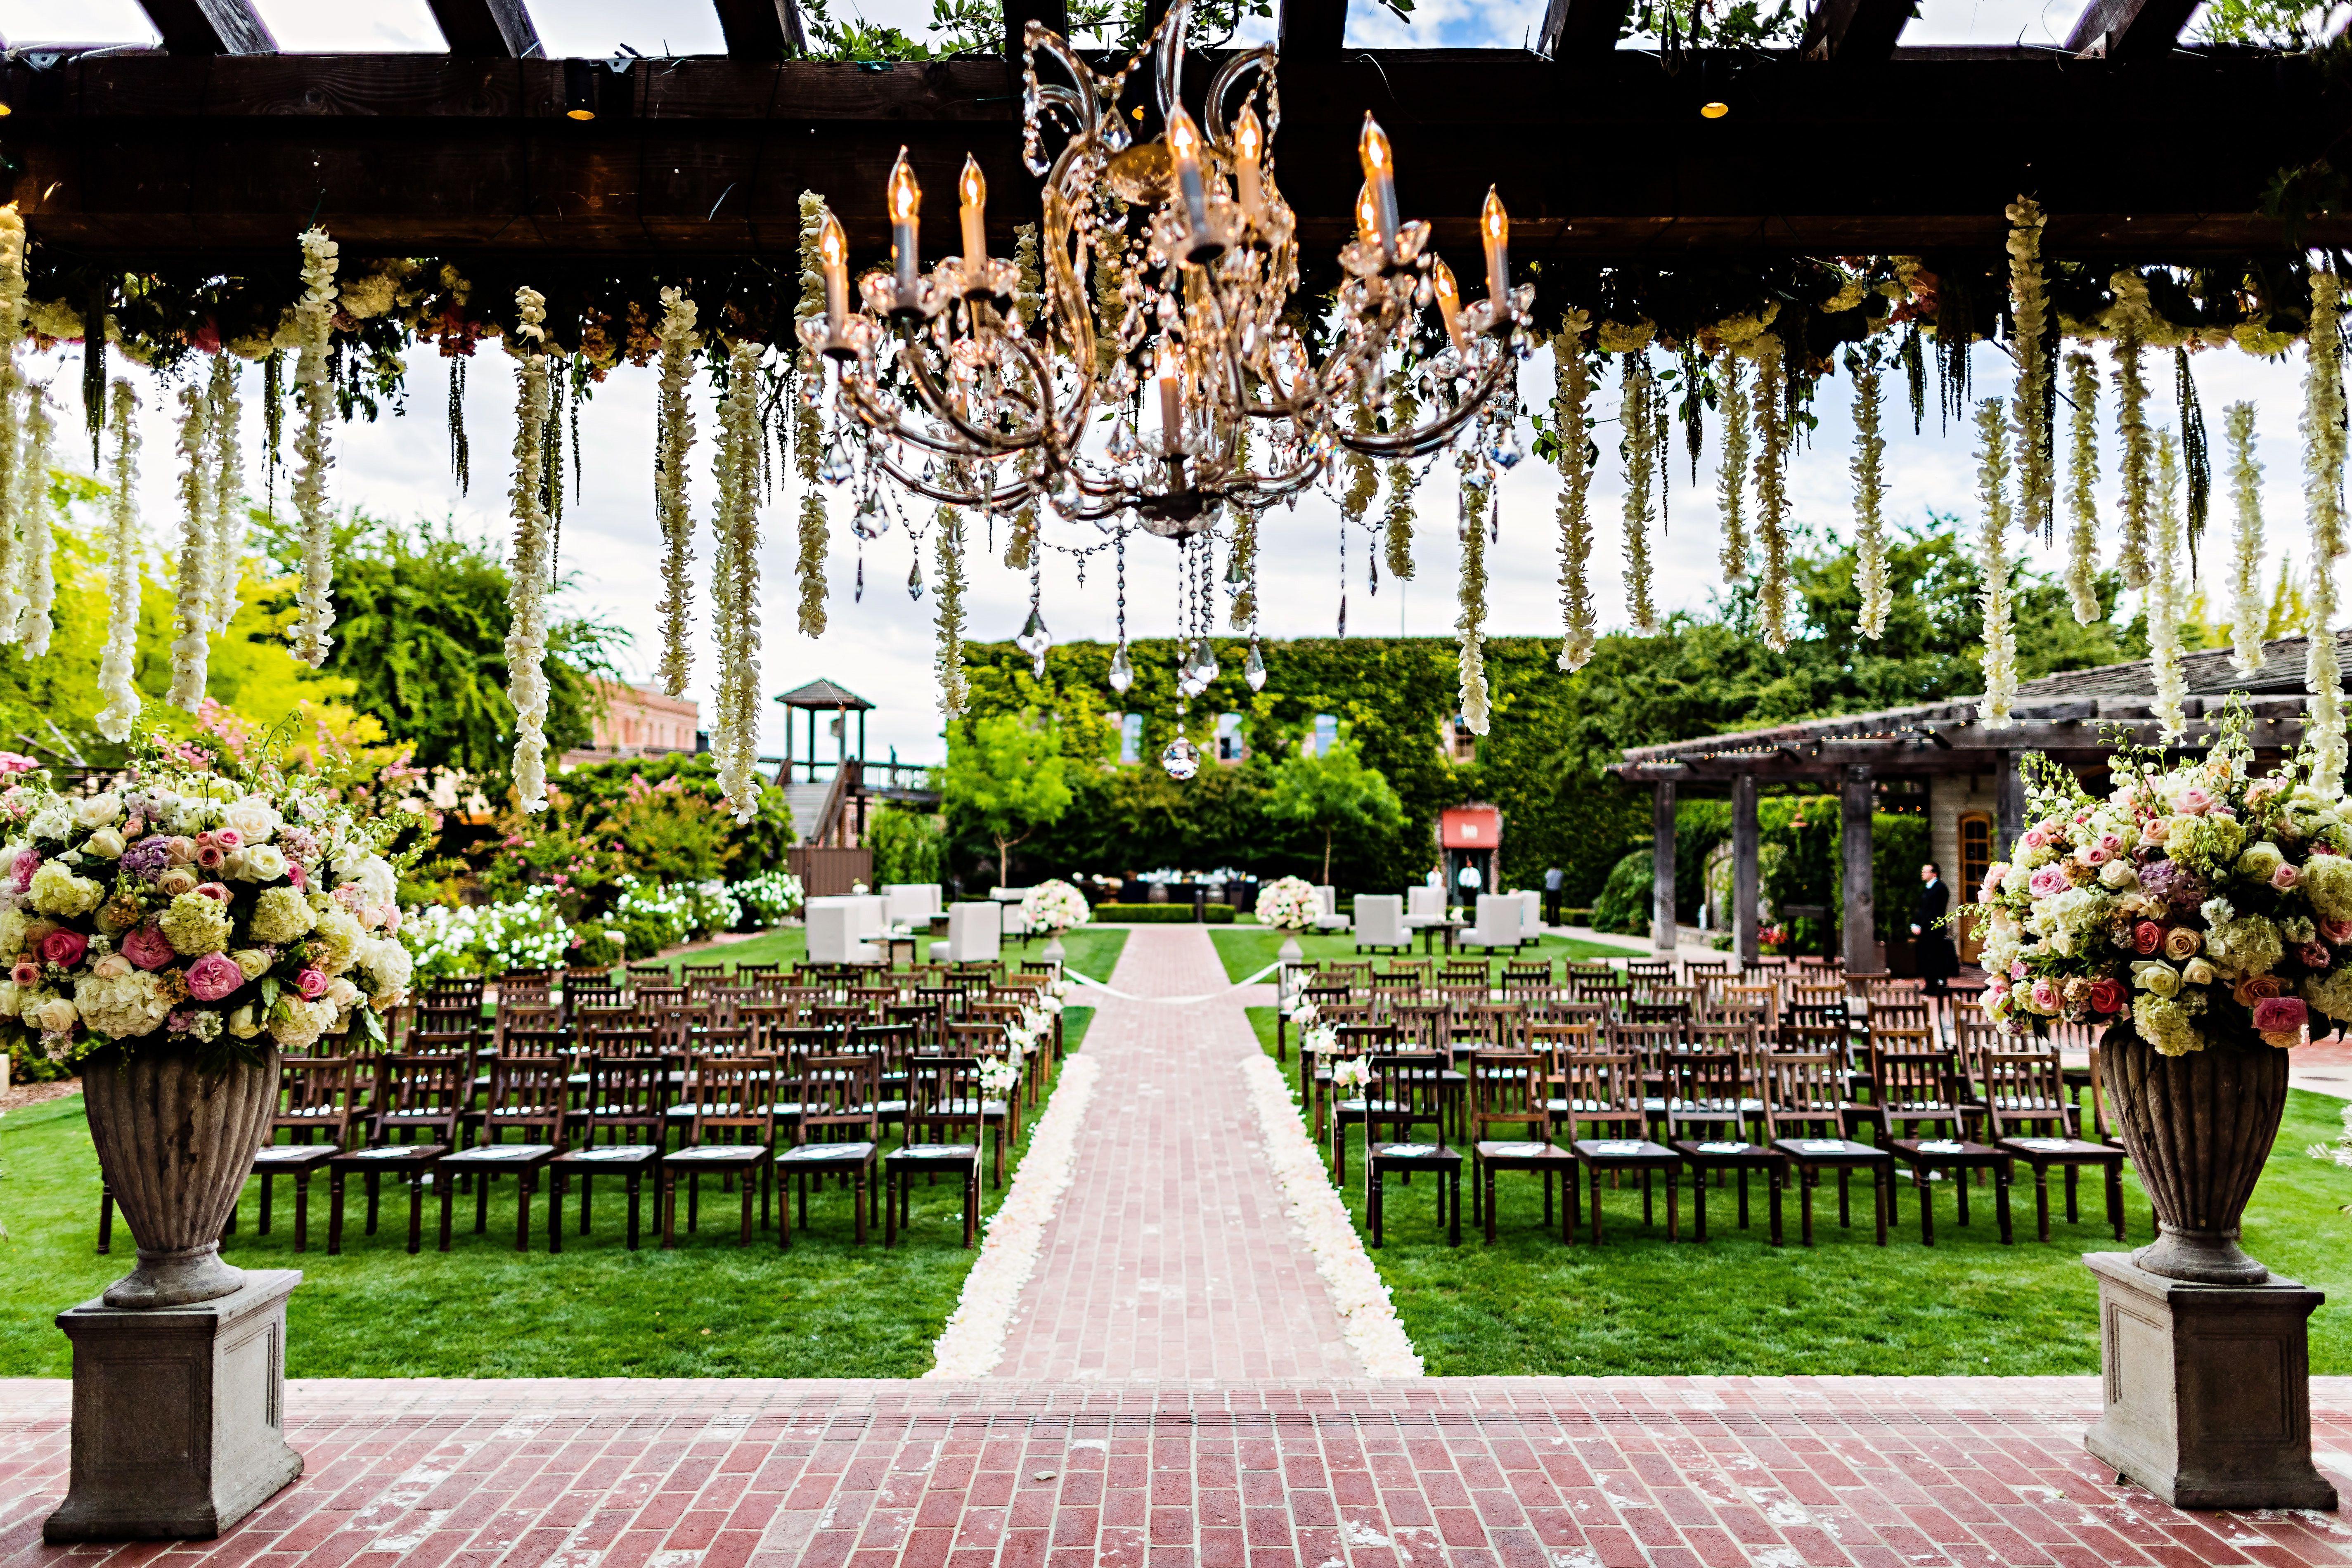 The Estate Yountville Napa Valley Napa valley wedding